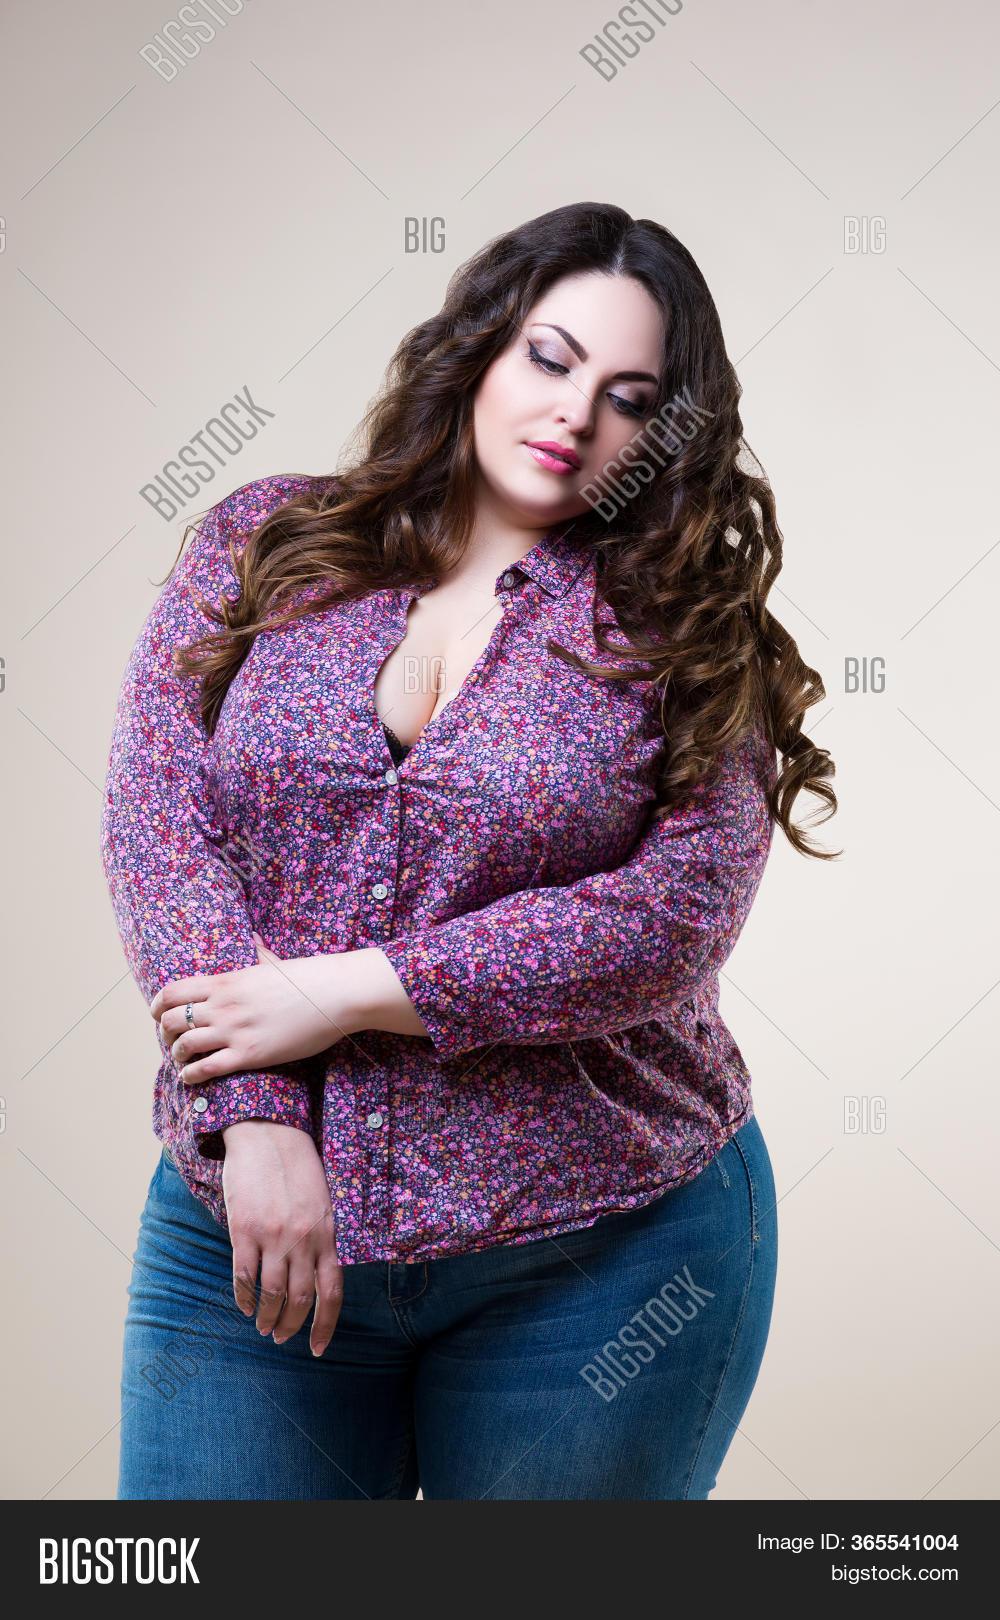 Chubby model